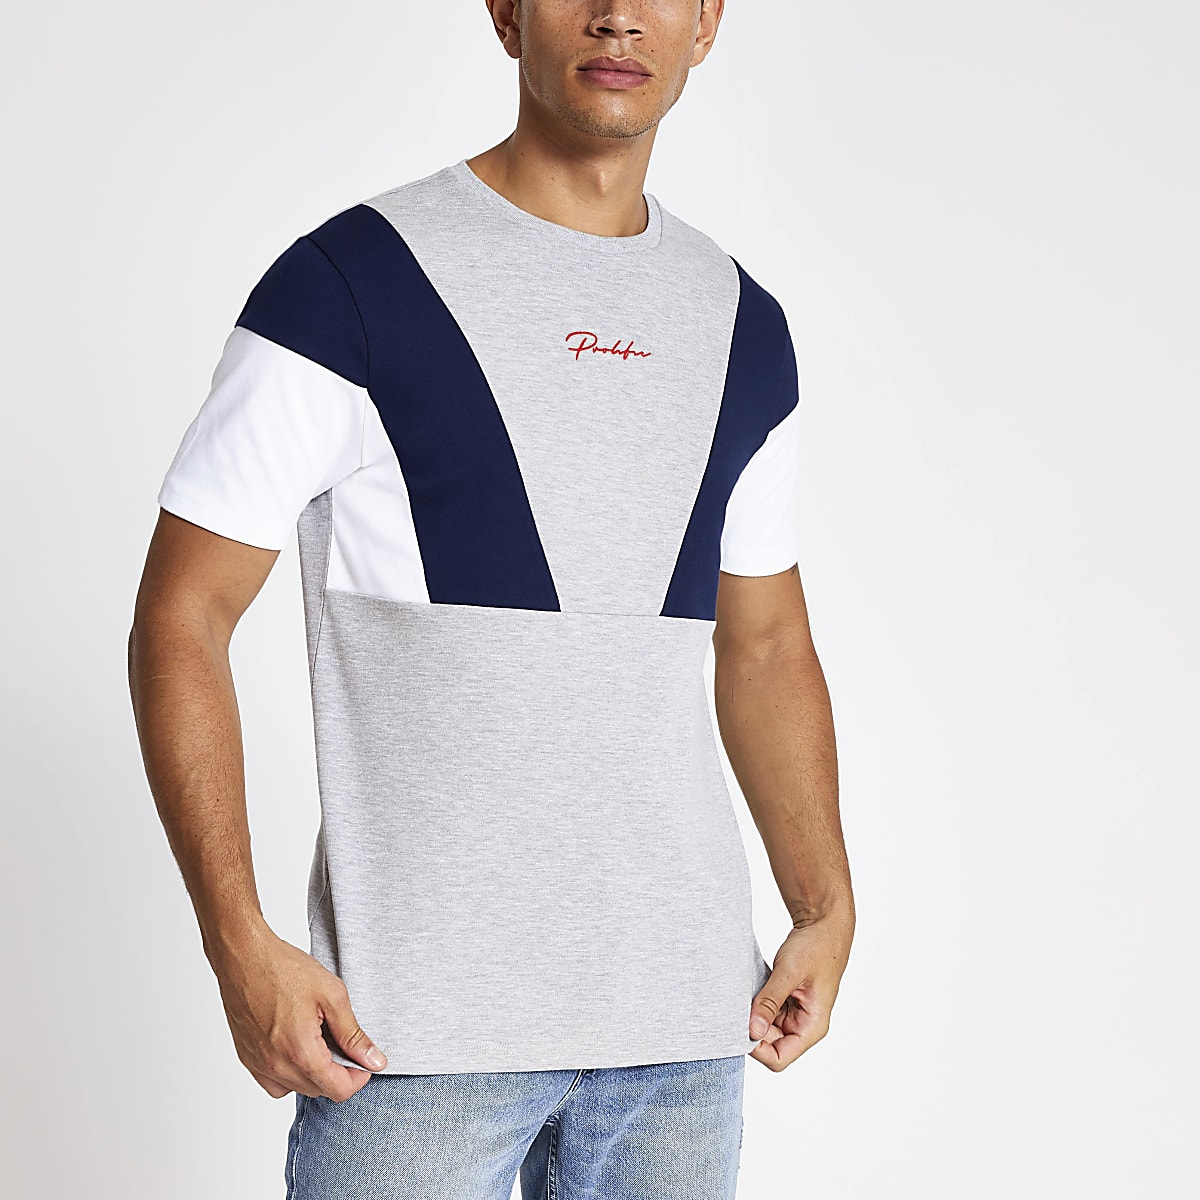 Prolific - Grijs slim-fit T-shirt met kleurvlak